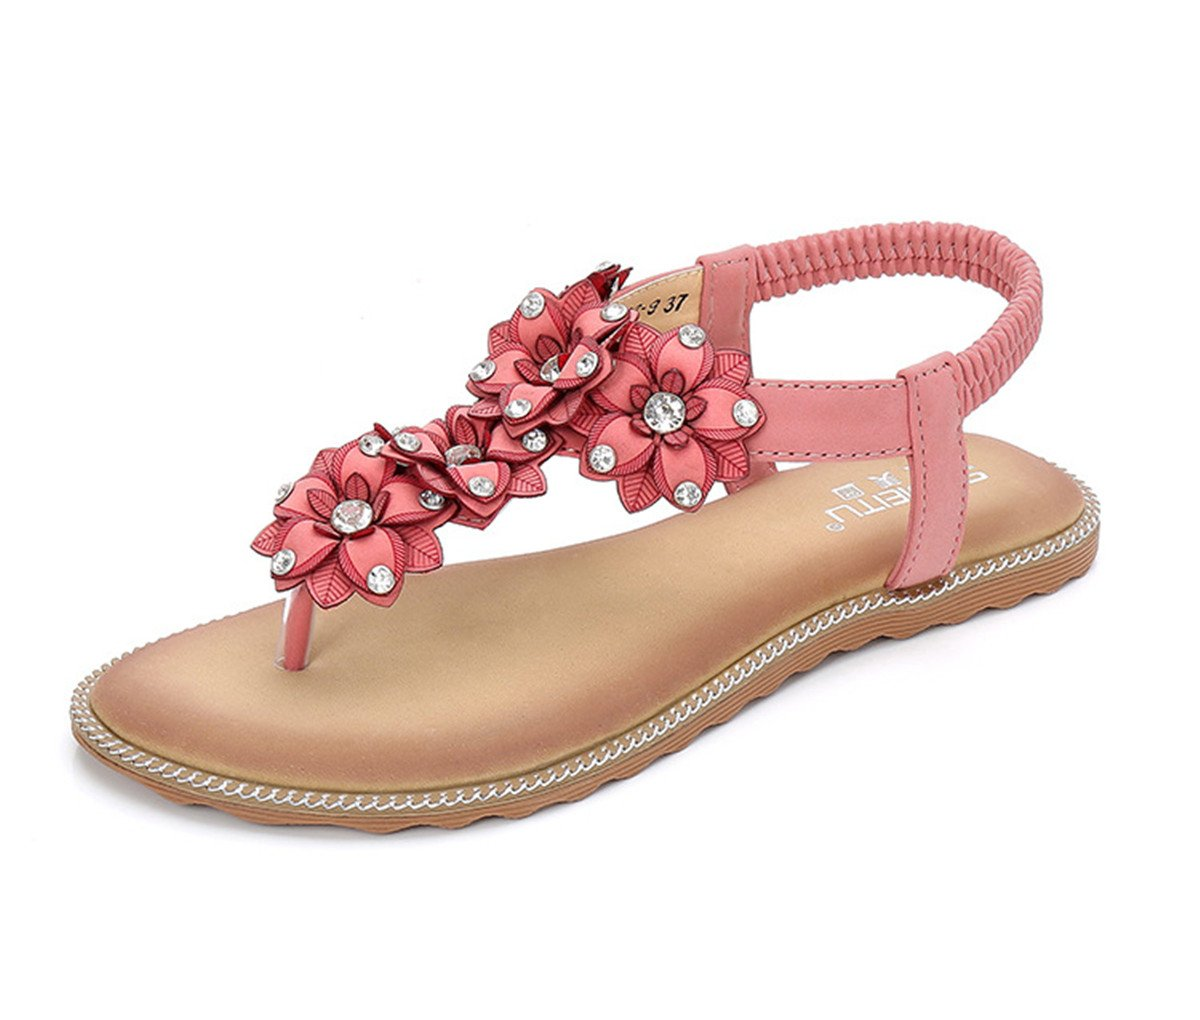 f3fa7d15a1de Womens Shoes Comfort Sandals Walking Shoes   Damen Sandalen   Sandalette  Sandalen fuuml r Frauen   Bouml hmische Sandalen   flache Unterseite clip  Stift ...